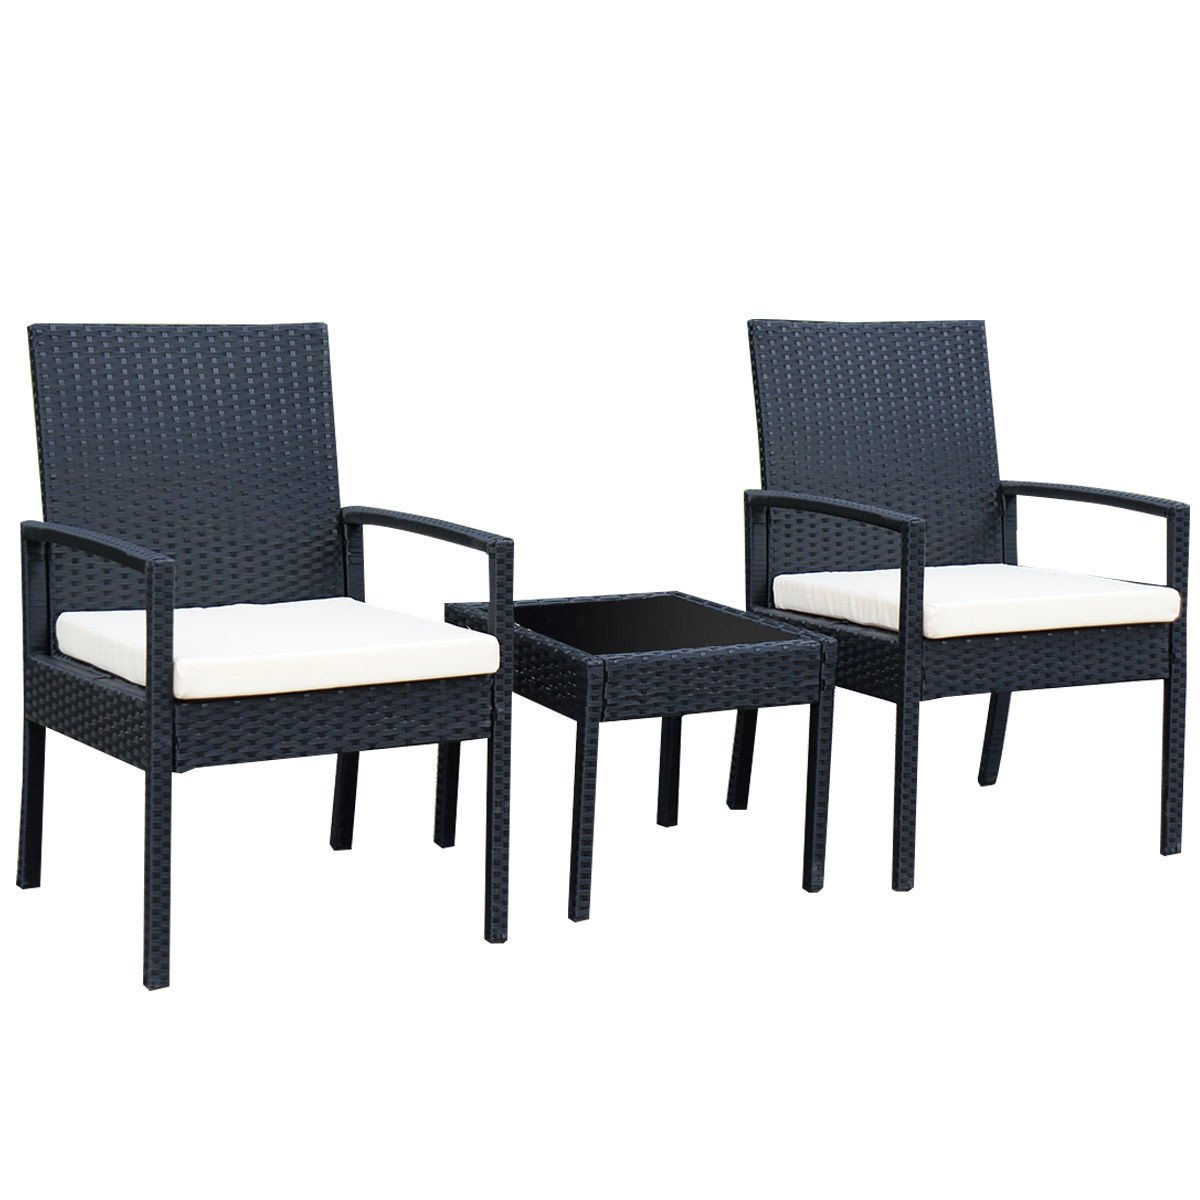 3 piece outdoor rattan patio furniture set